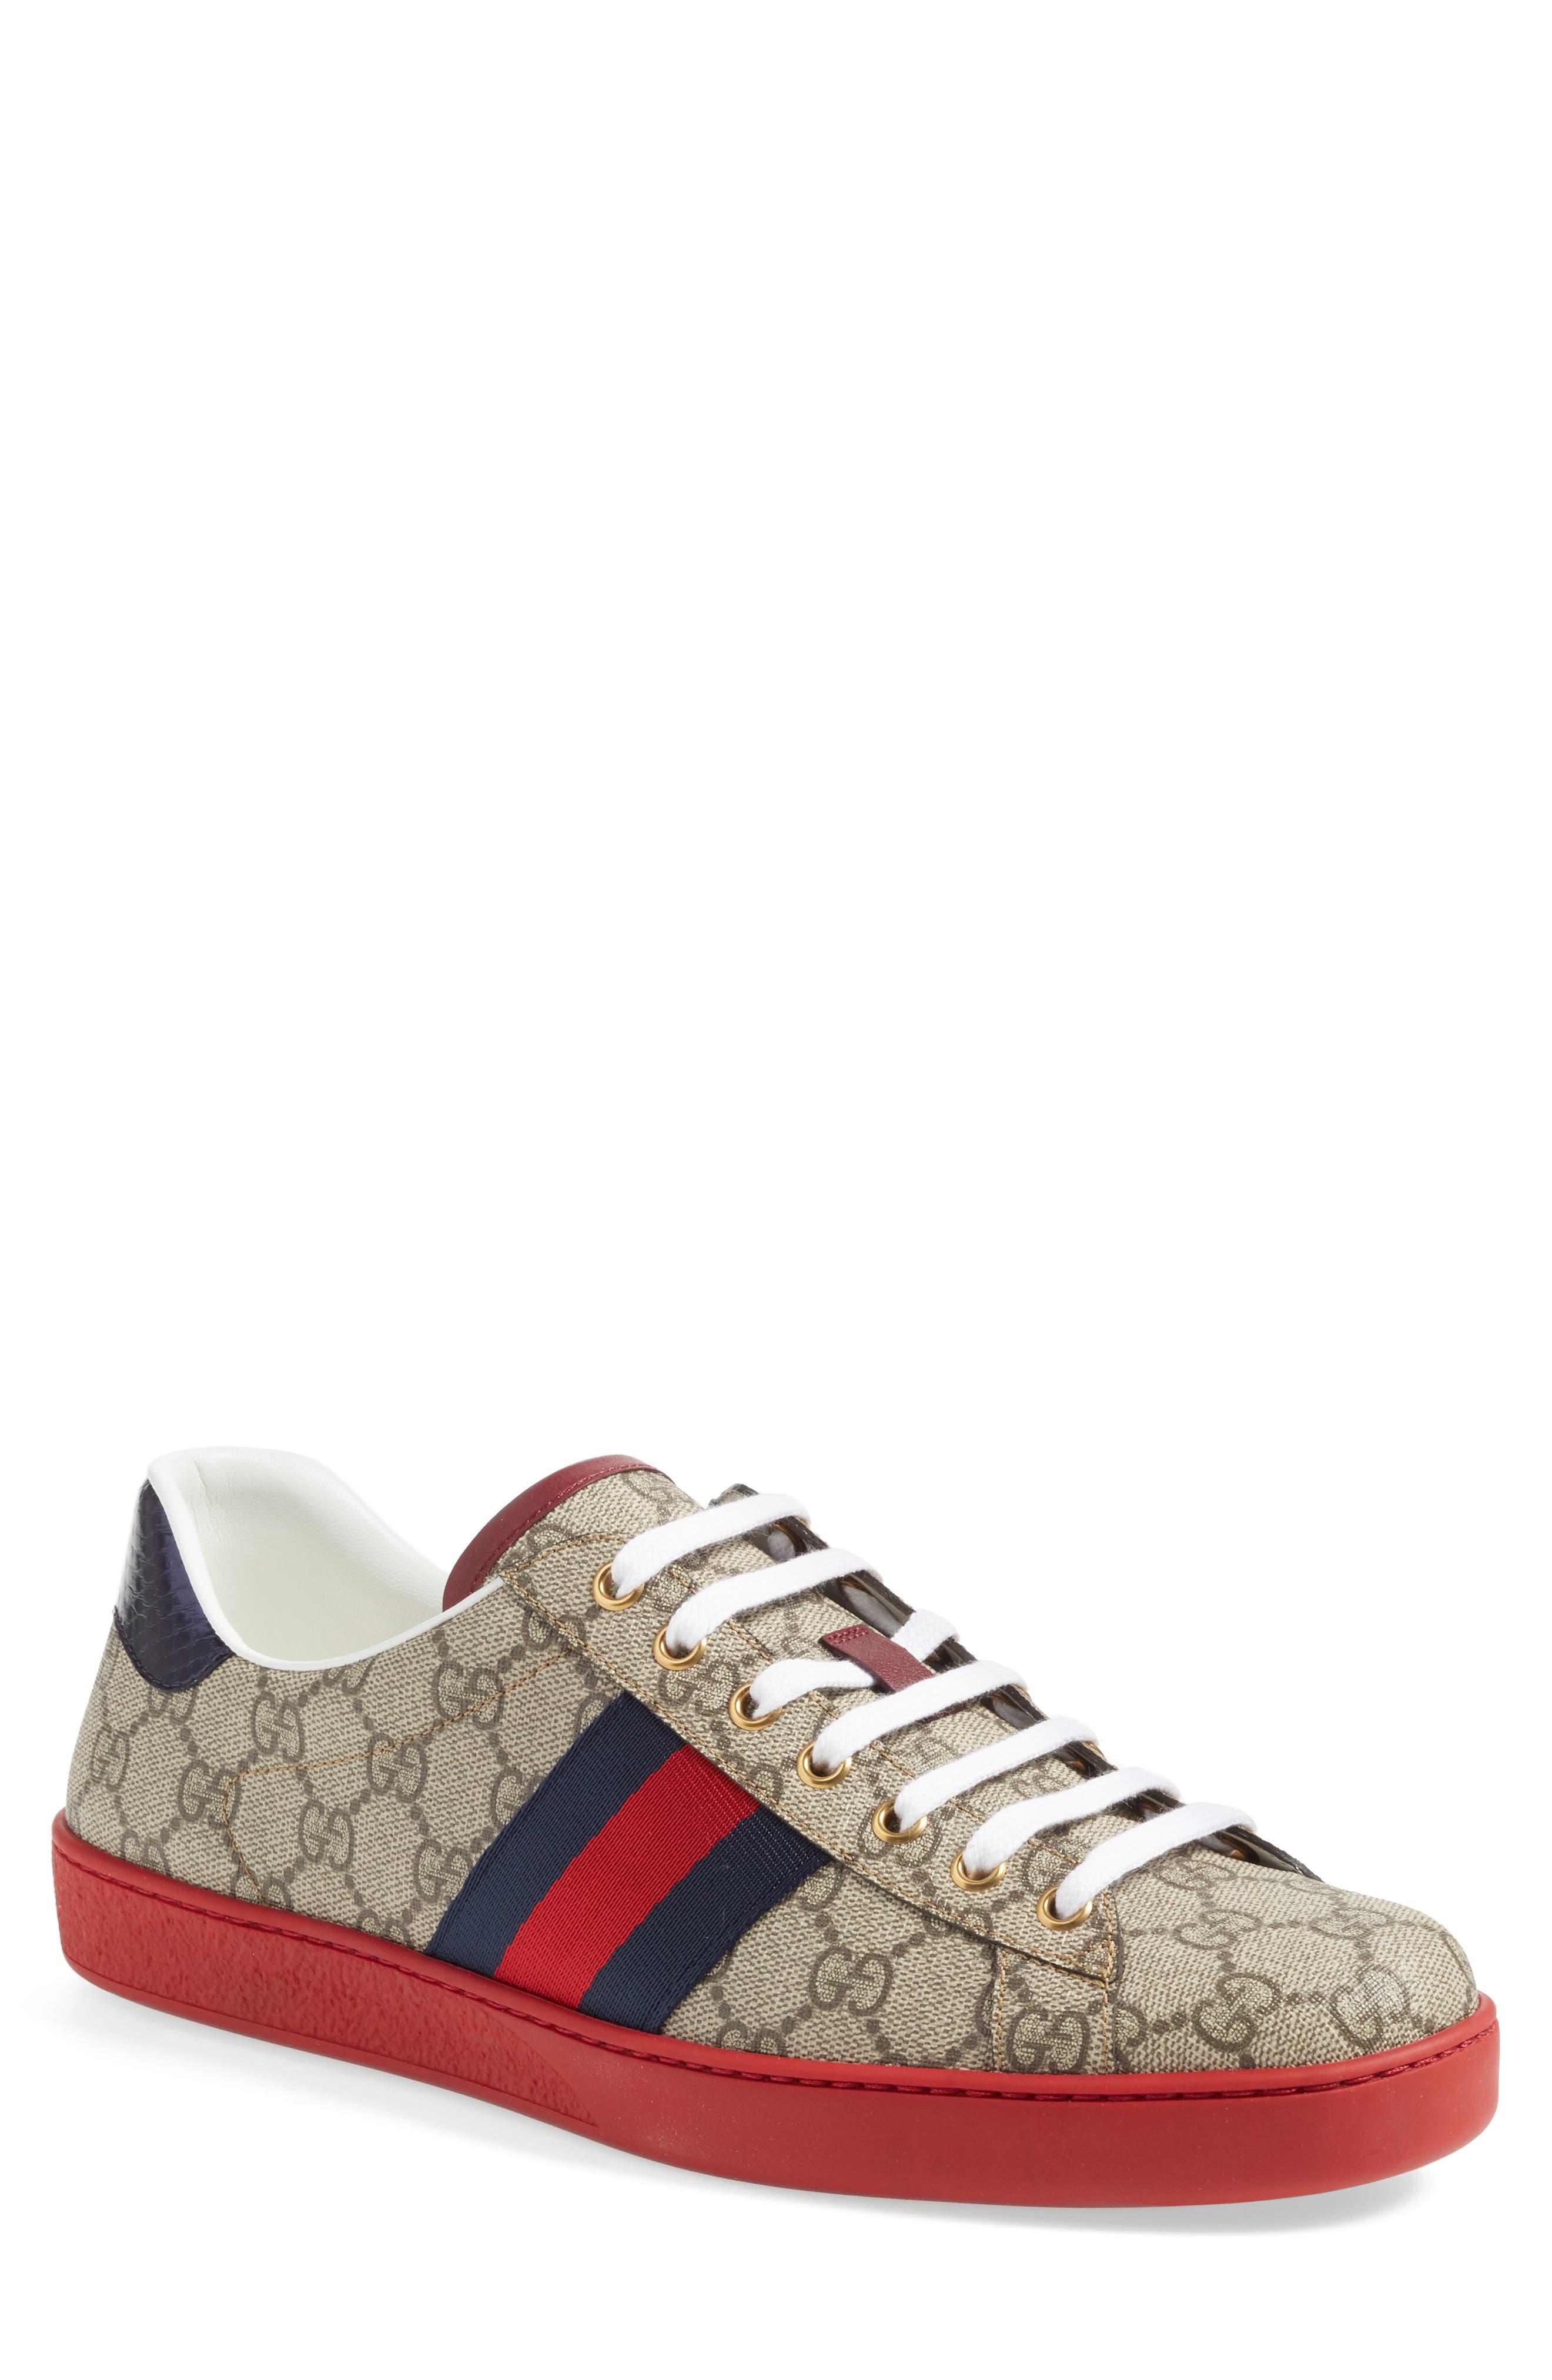 New Ace Webbed Low Top Sneaker, Main, color, BEIGE